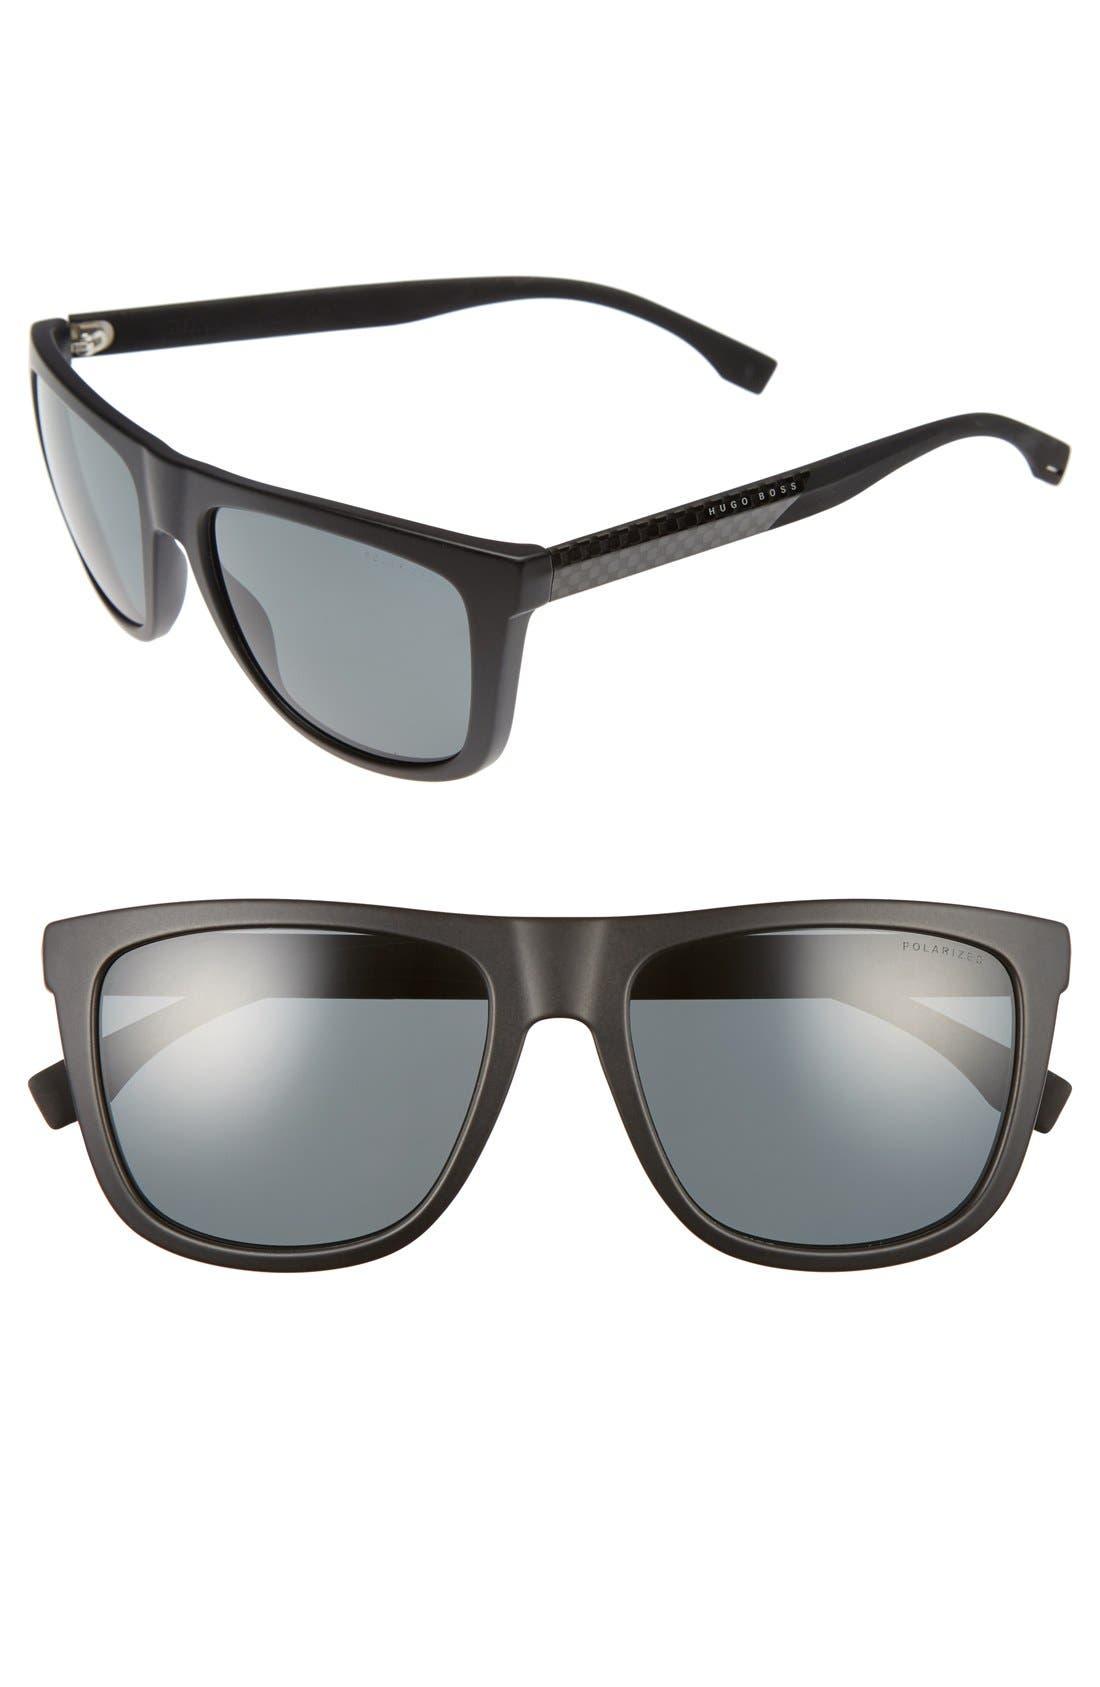 56mm Polarized Sunglasses,                             Alternate thumbnail 3, color,                             001